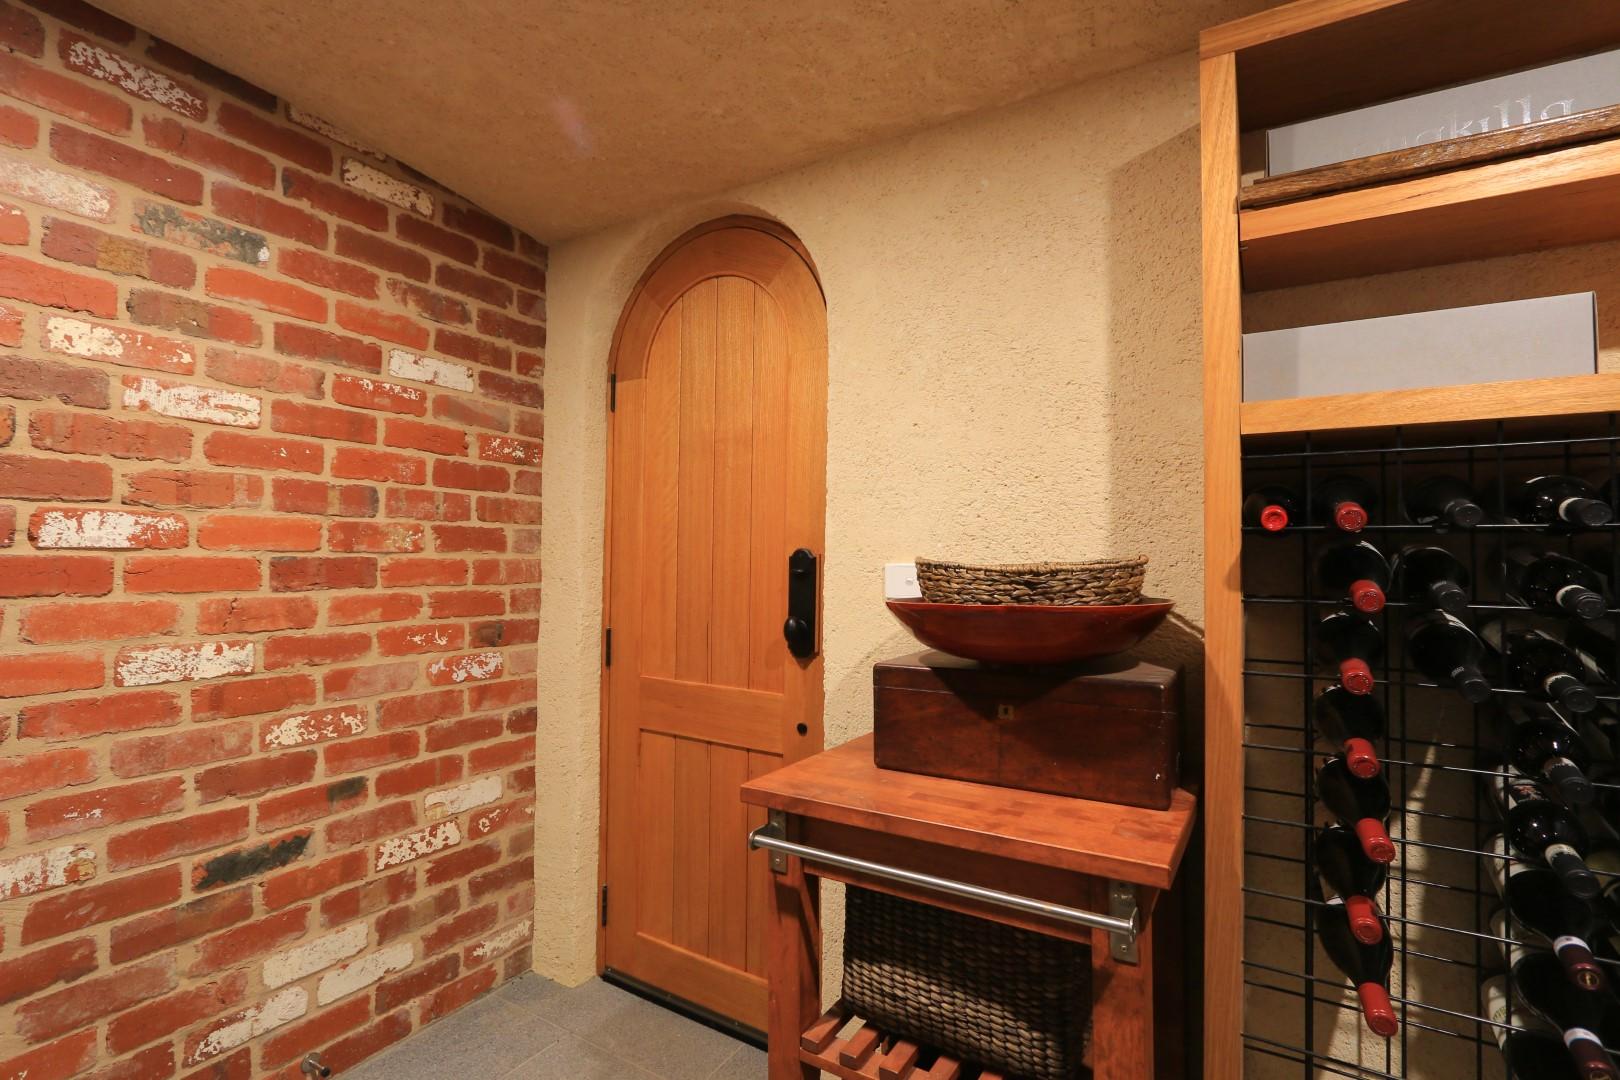 D95 Brick Oven - Brad - 14